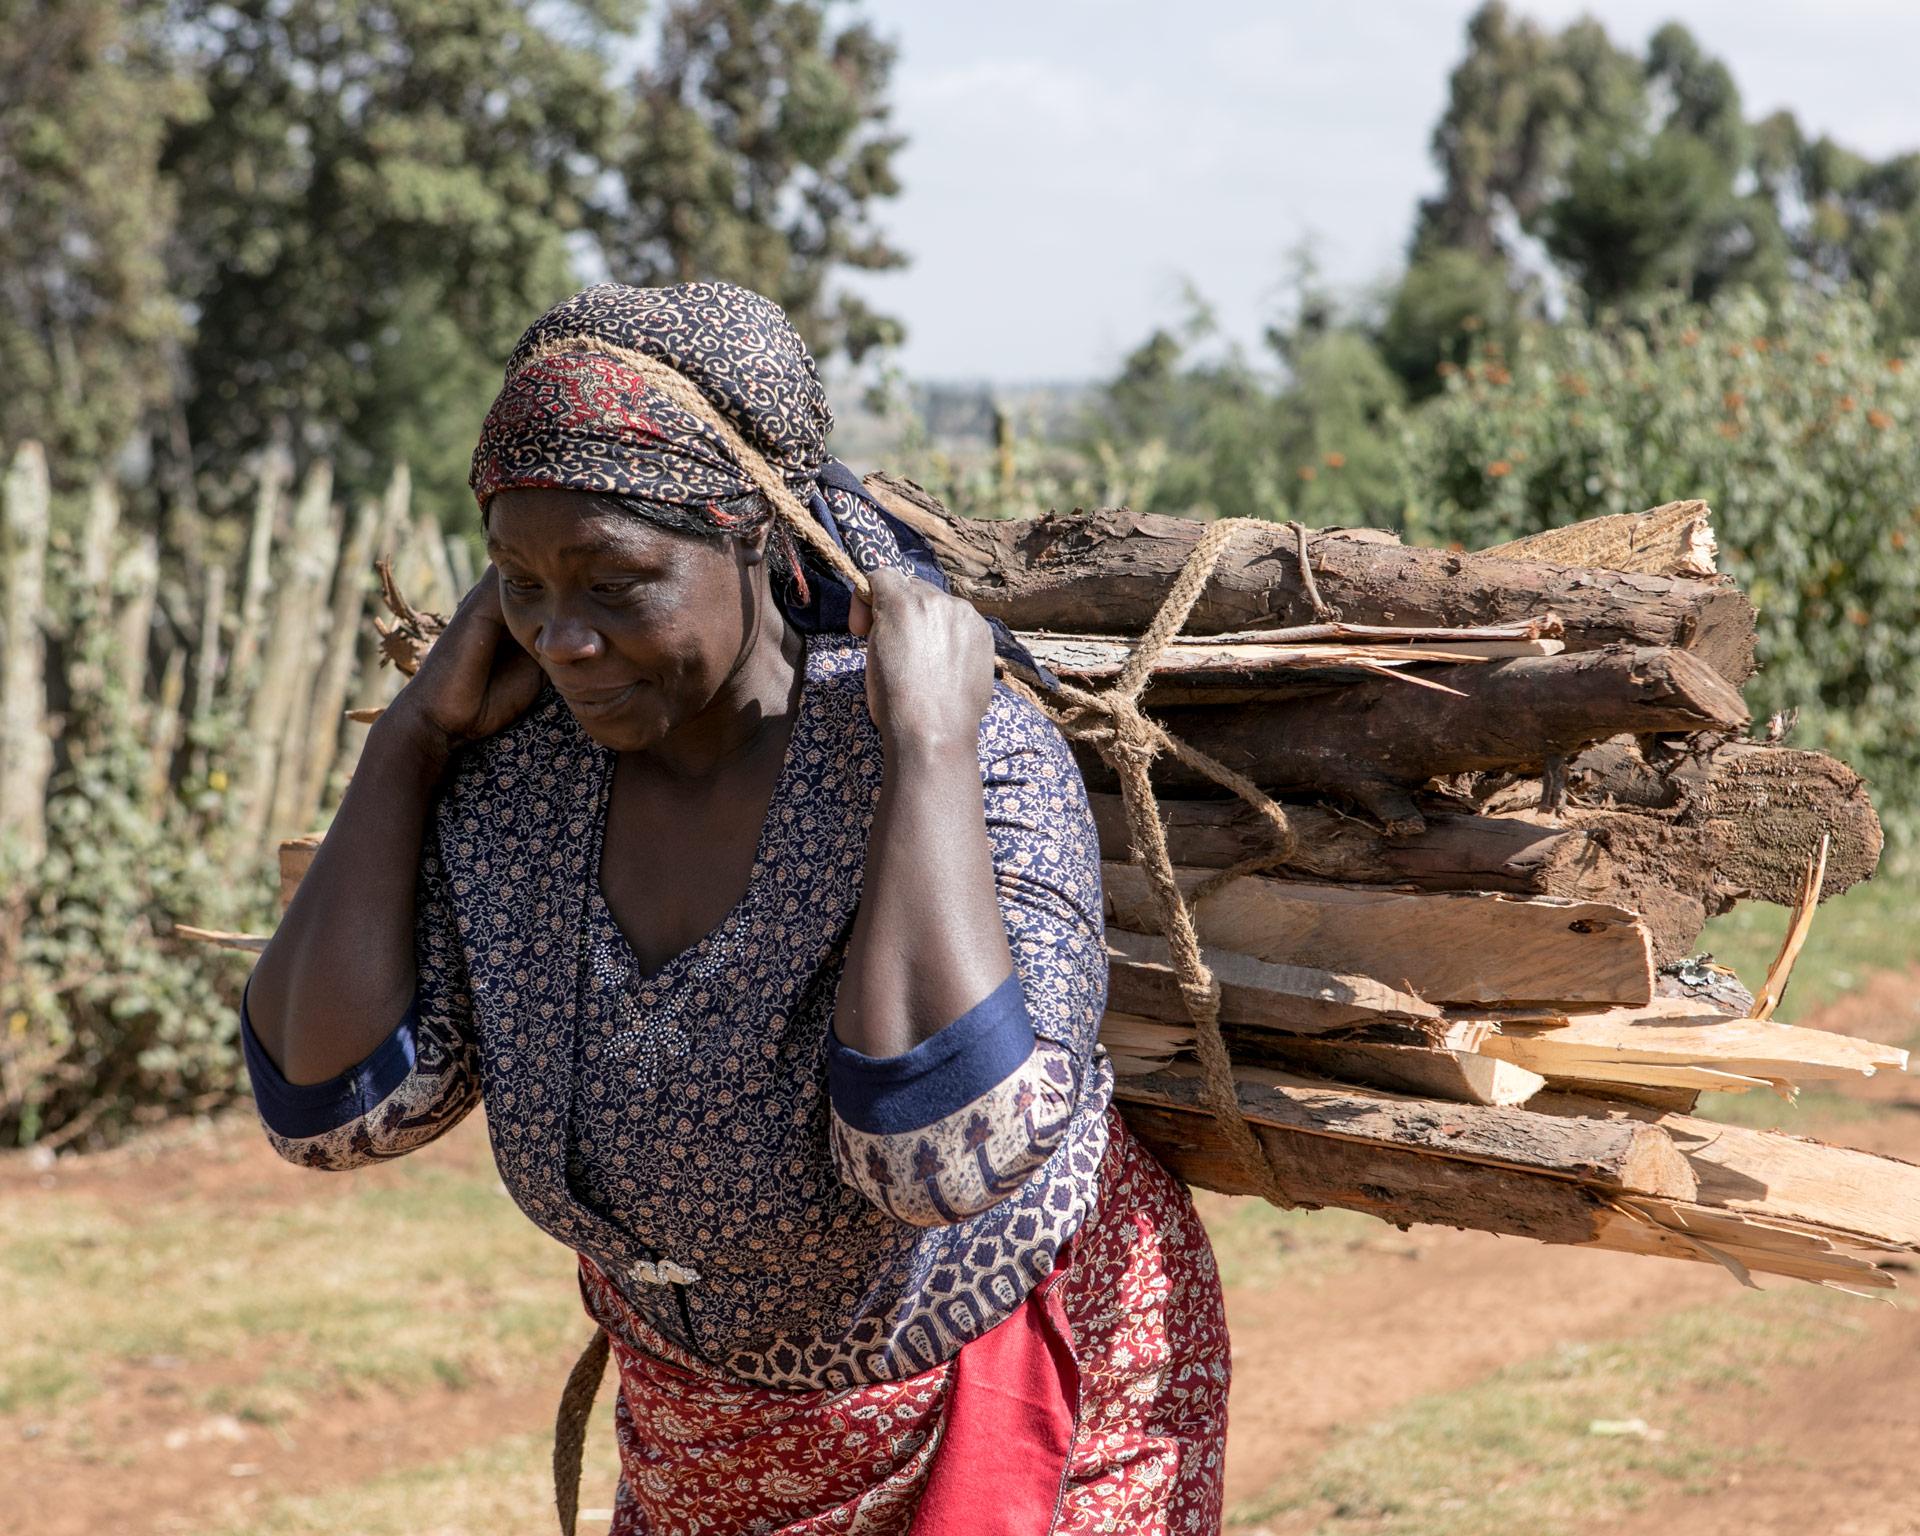 stufa salomè legna matteo de mayda kenya mani tese 2018